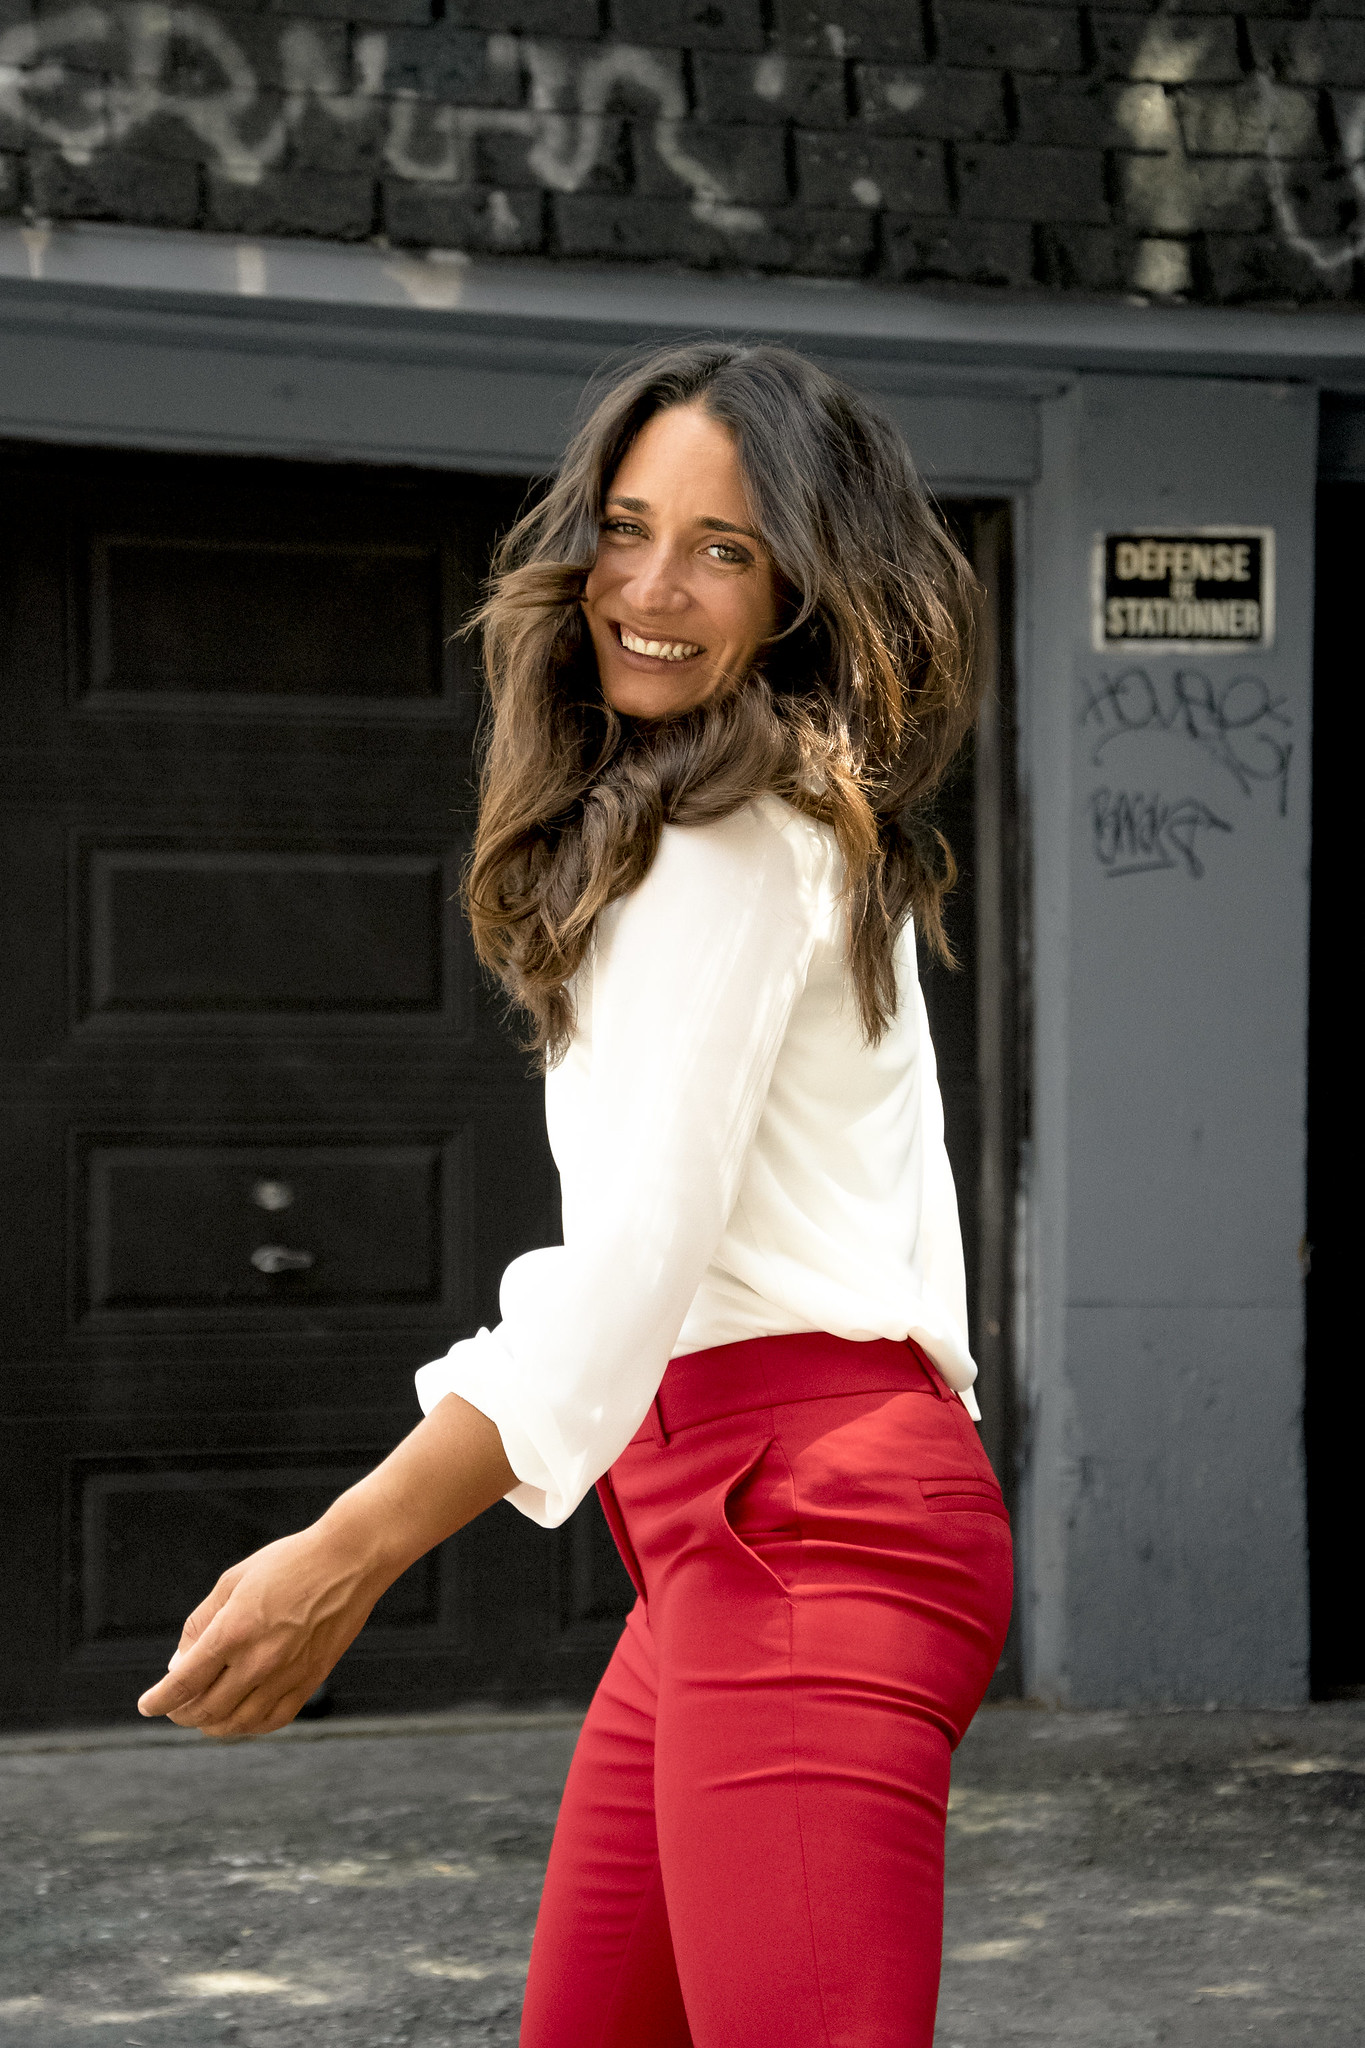 camille dg pantalons rouges garage